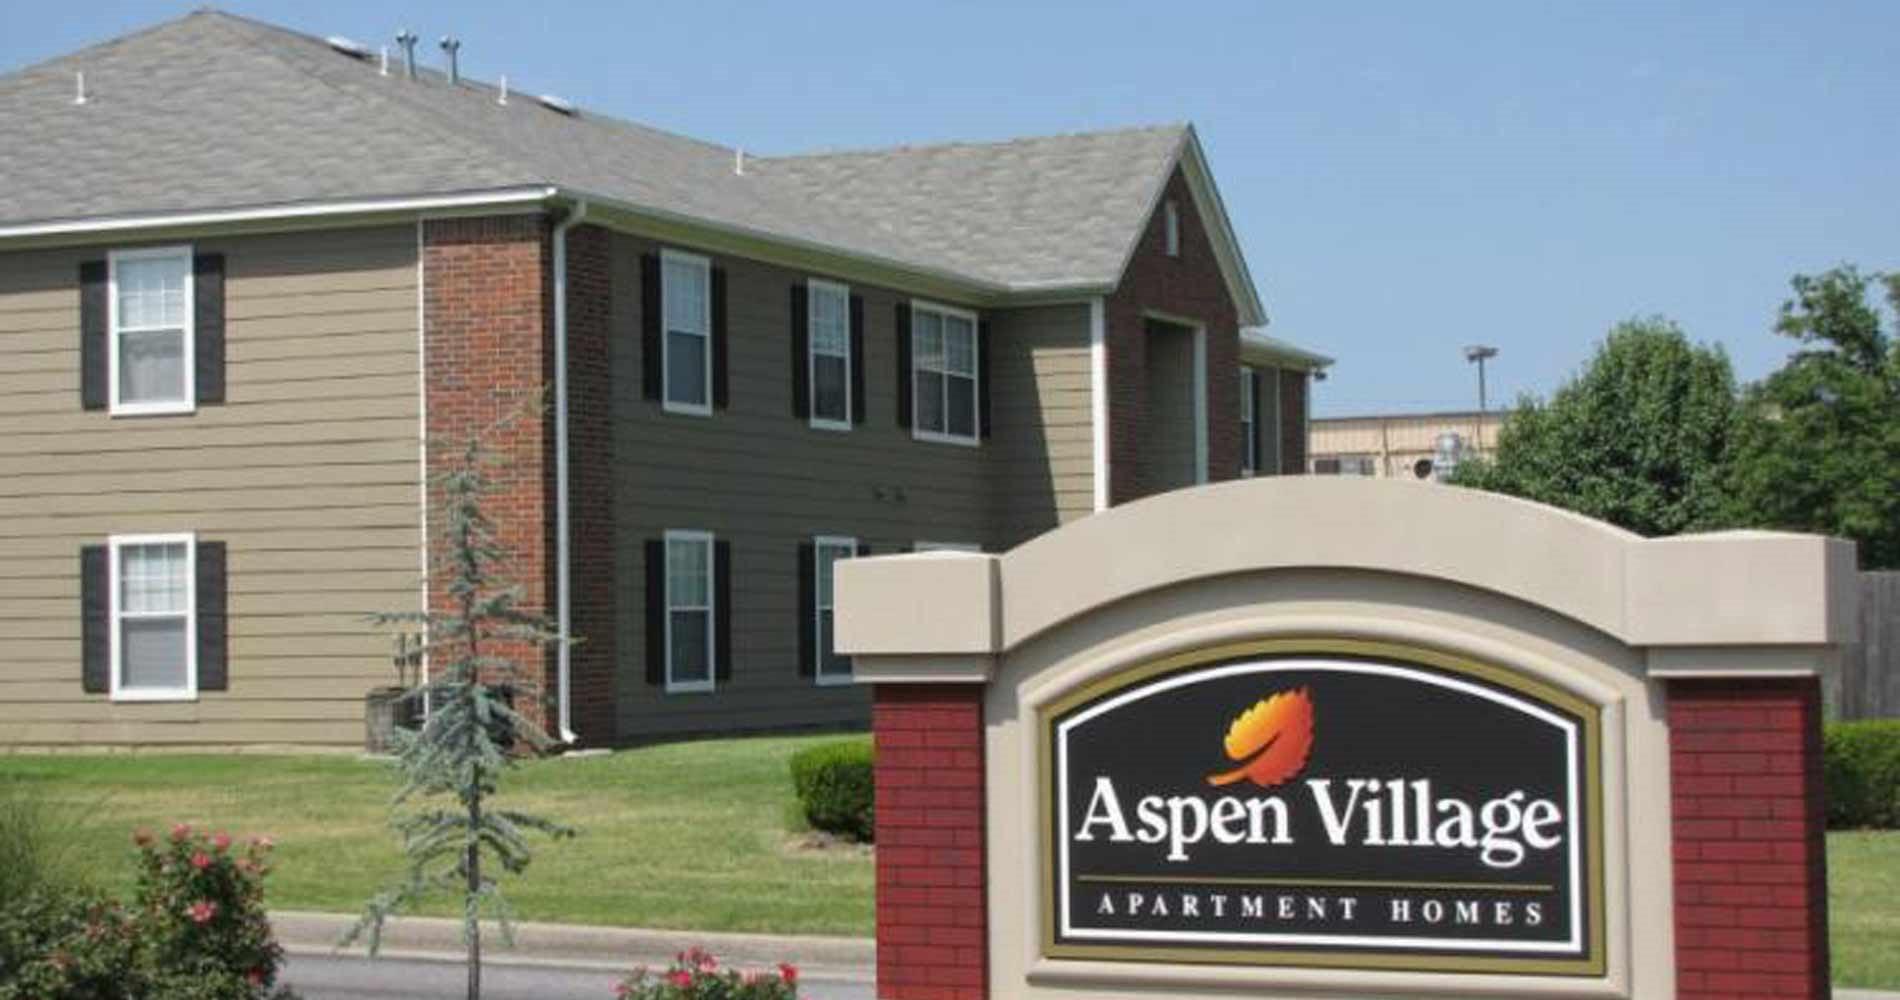 Login to Aspen Village Apartments Resident Services | Aspen Village ...